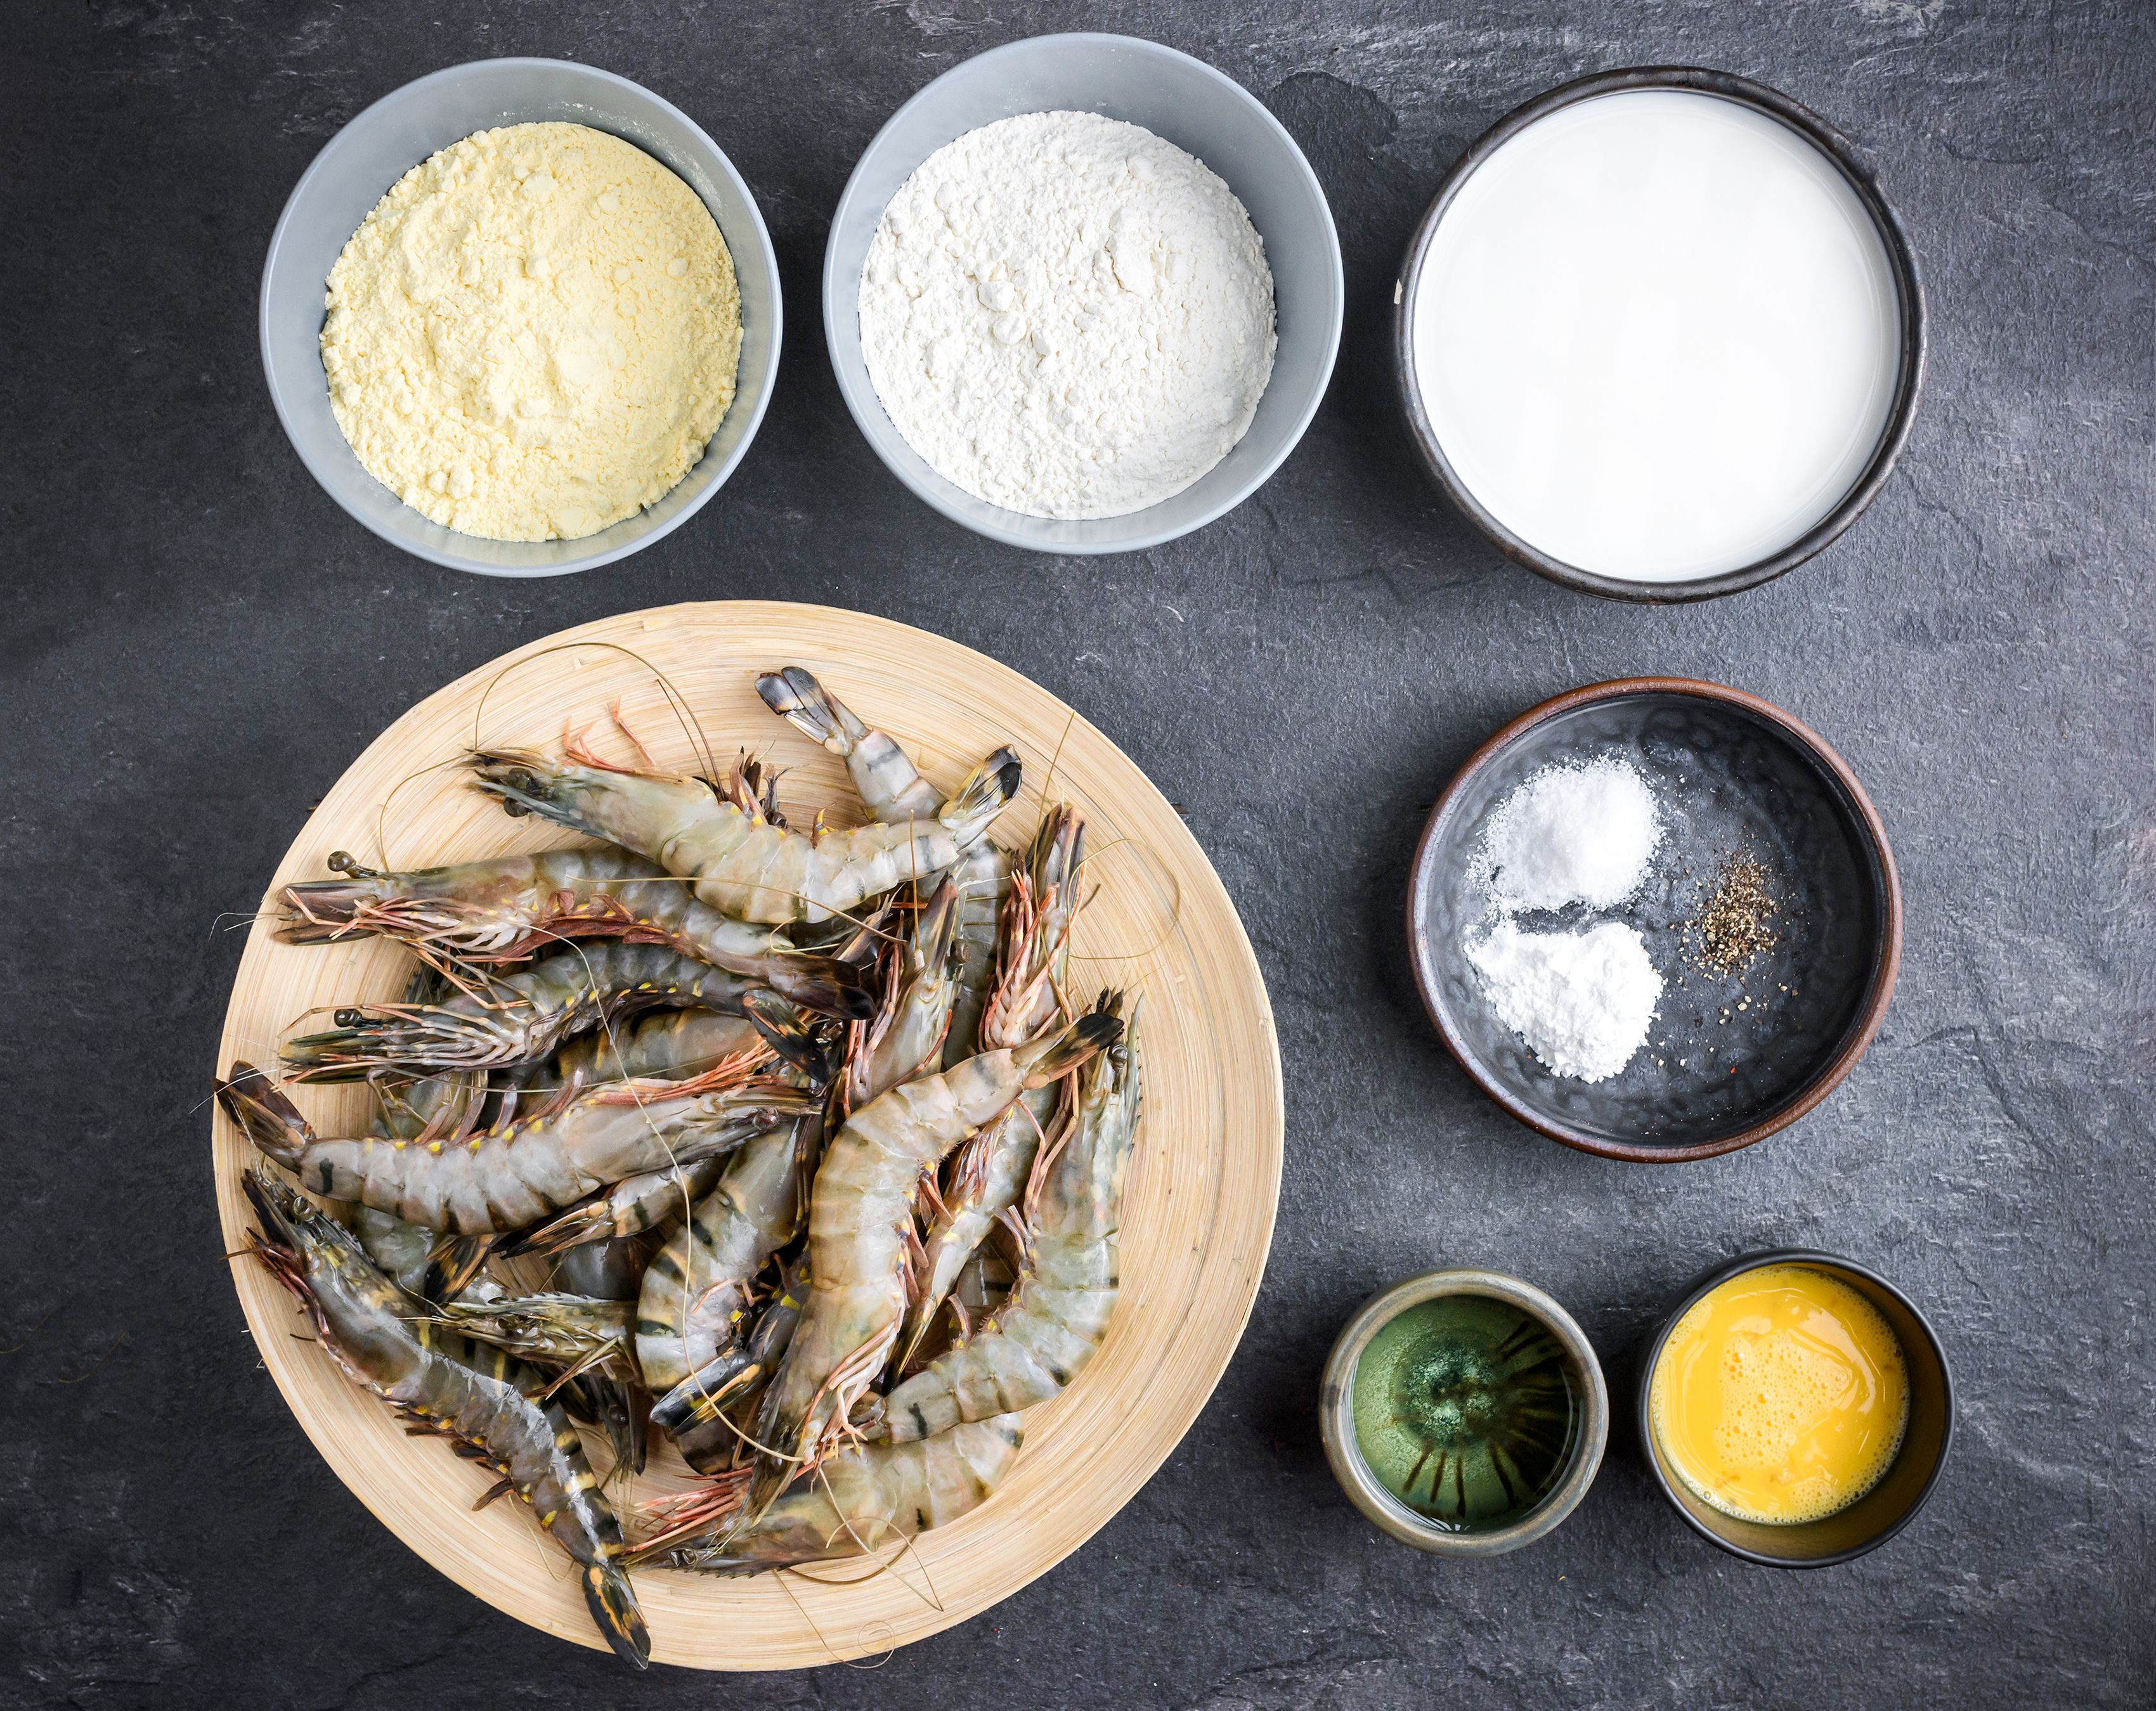 Cornmeal Fried Shrimp Recipe ingredients